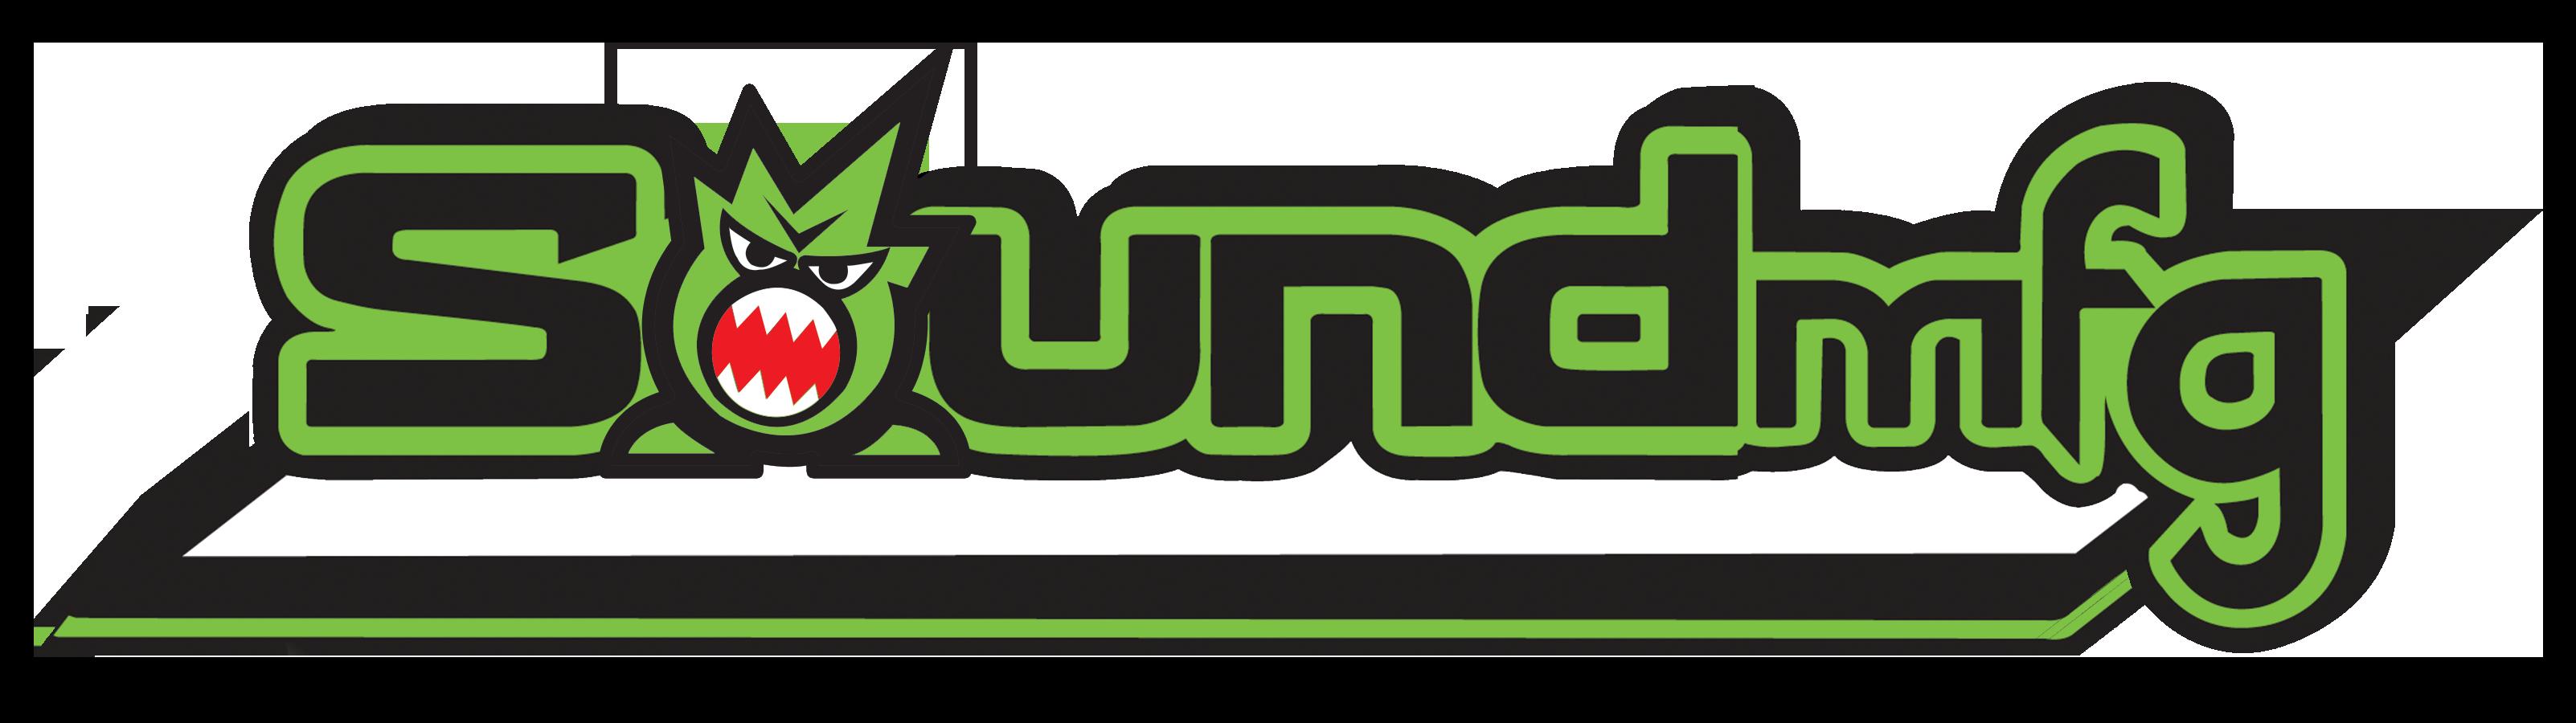 Sound Manufacturing Inc., Company Logo